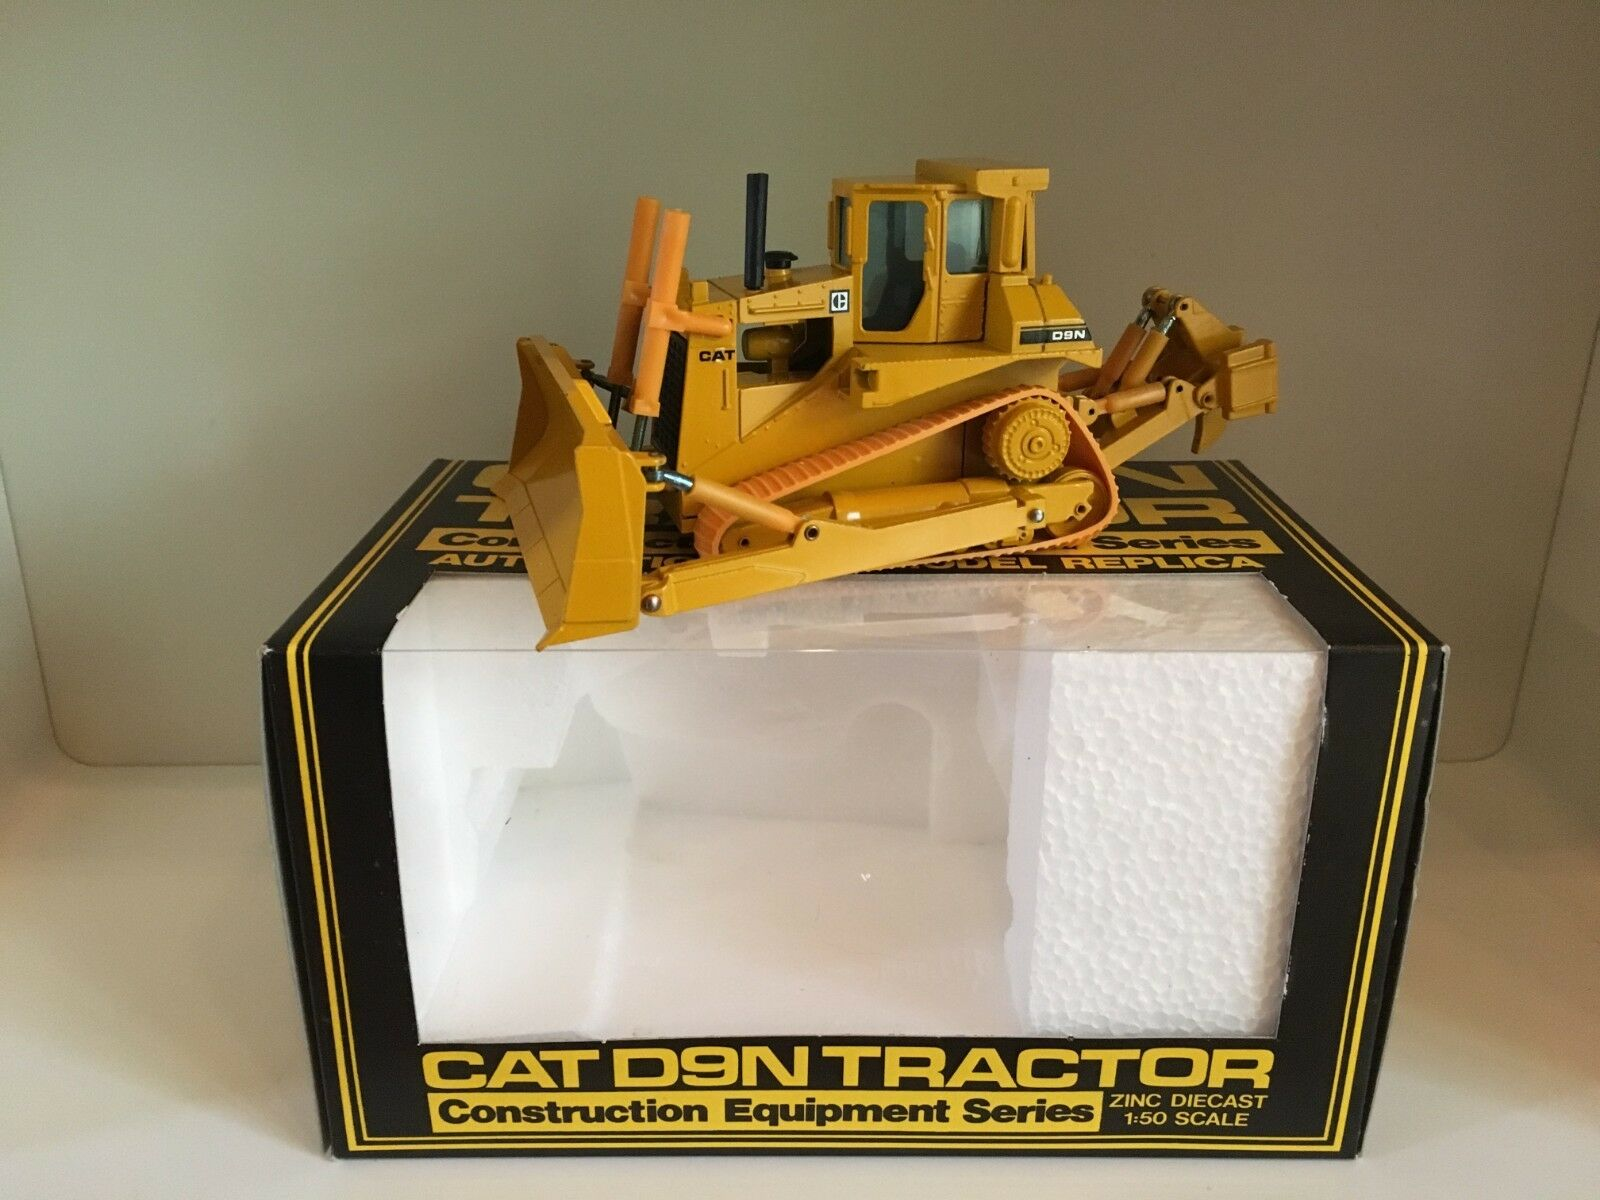 Caterpillar d 9 n bulldozer de NZG 298 1 50 OVP